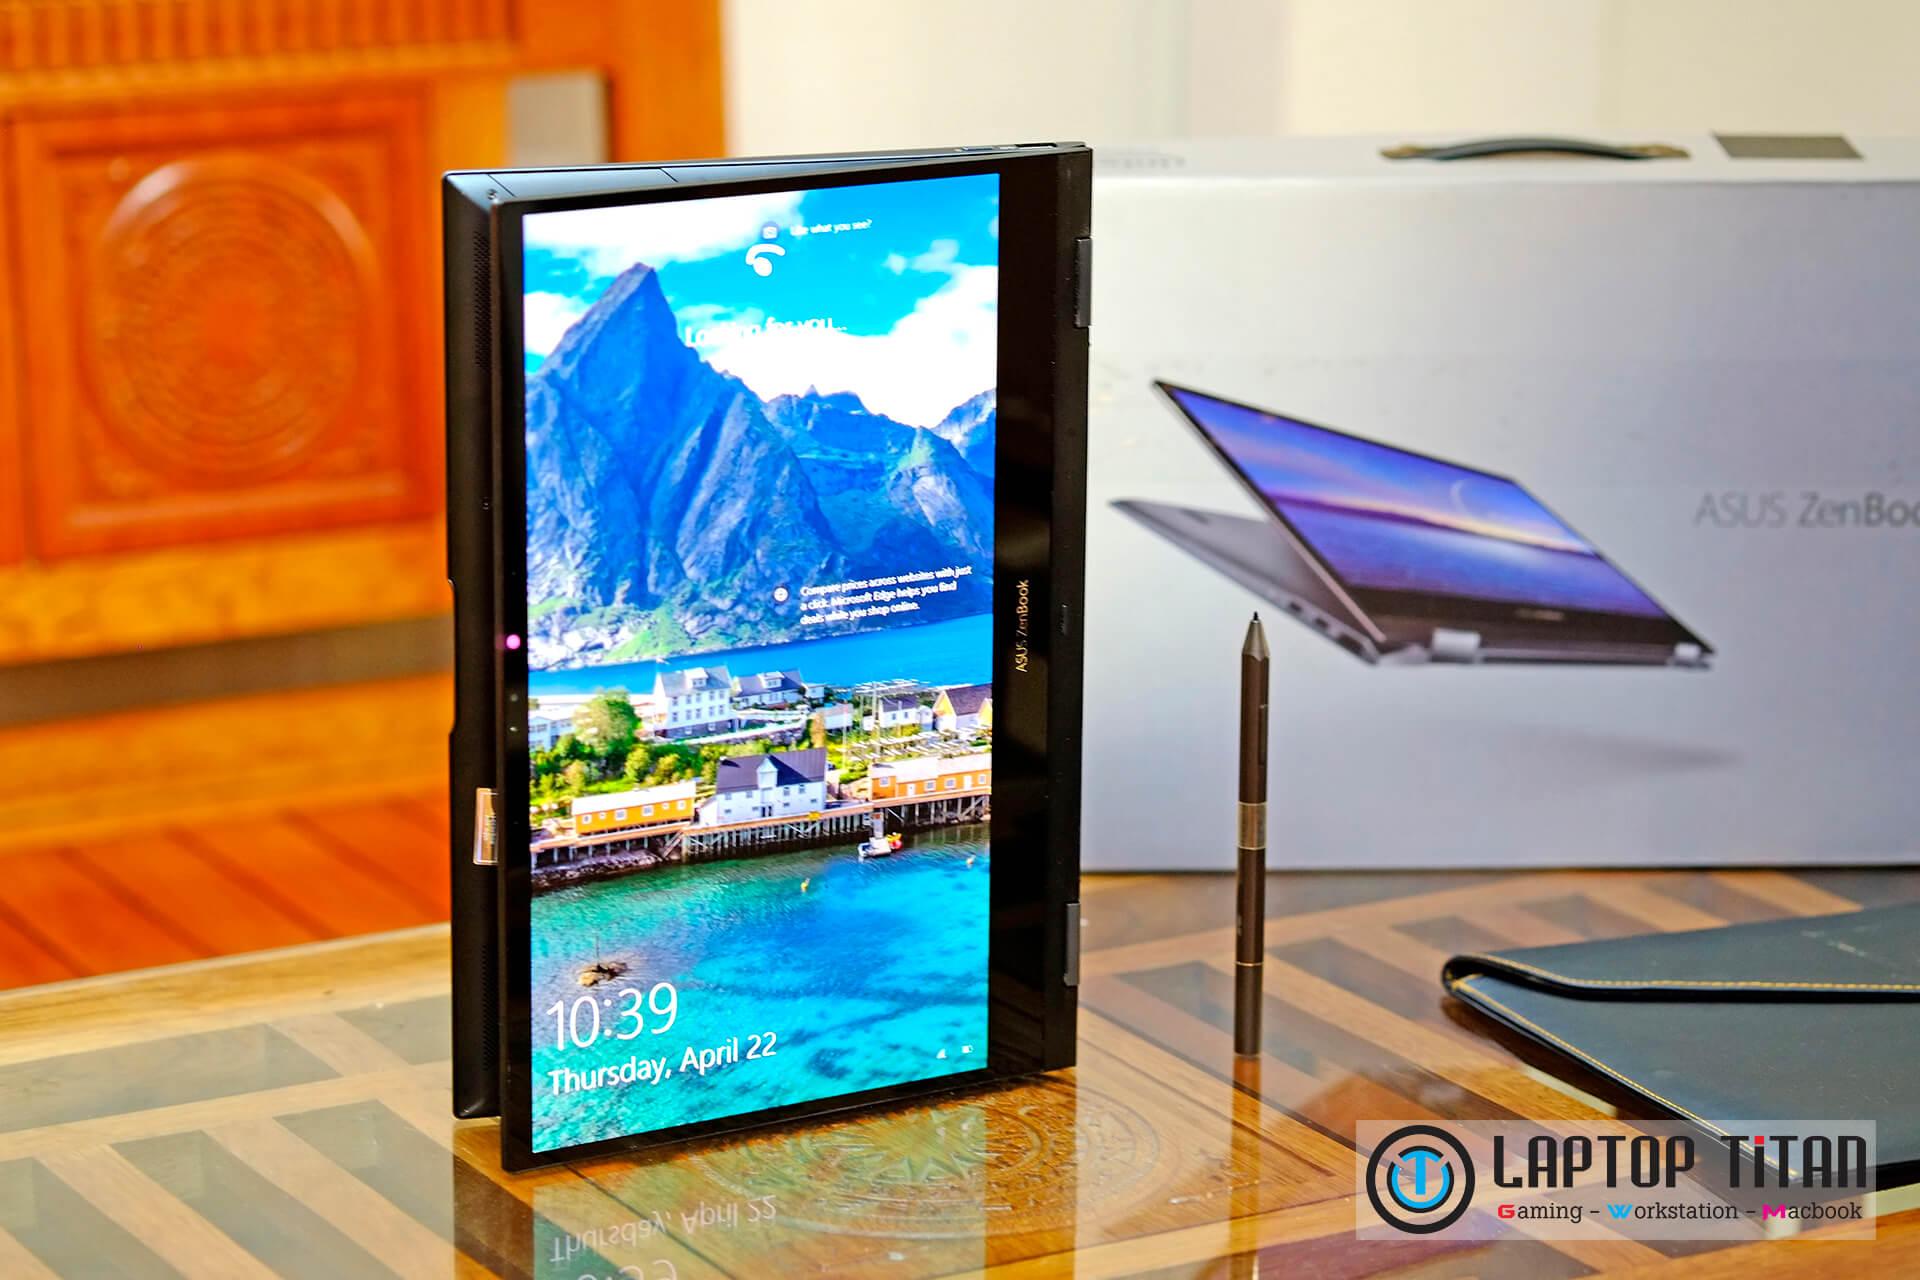 Asus Zenbook Flip UX363EA-HP130T-0011